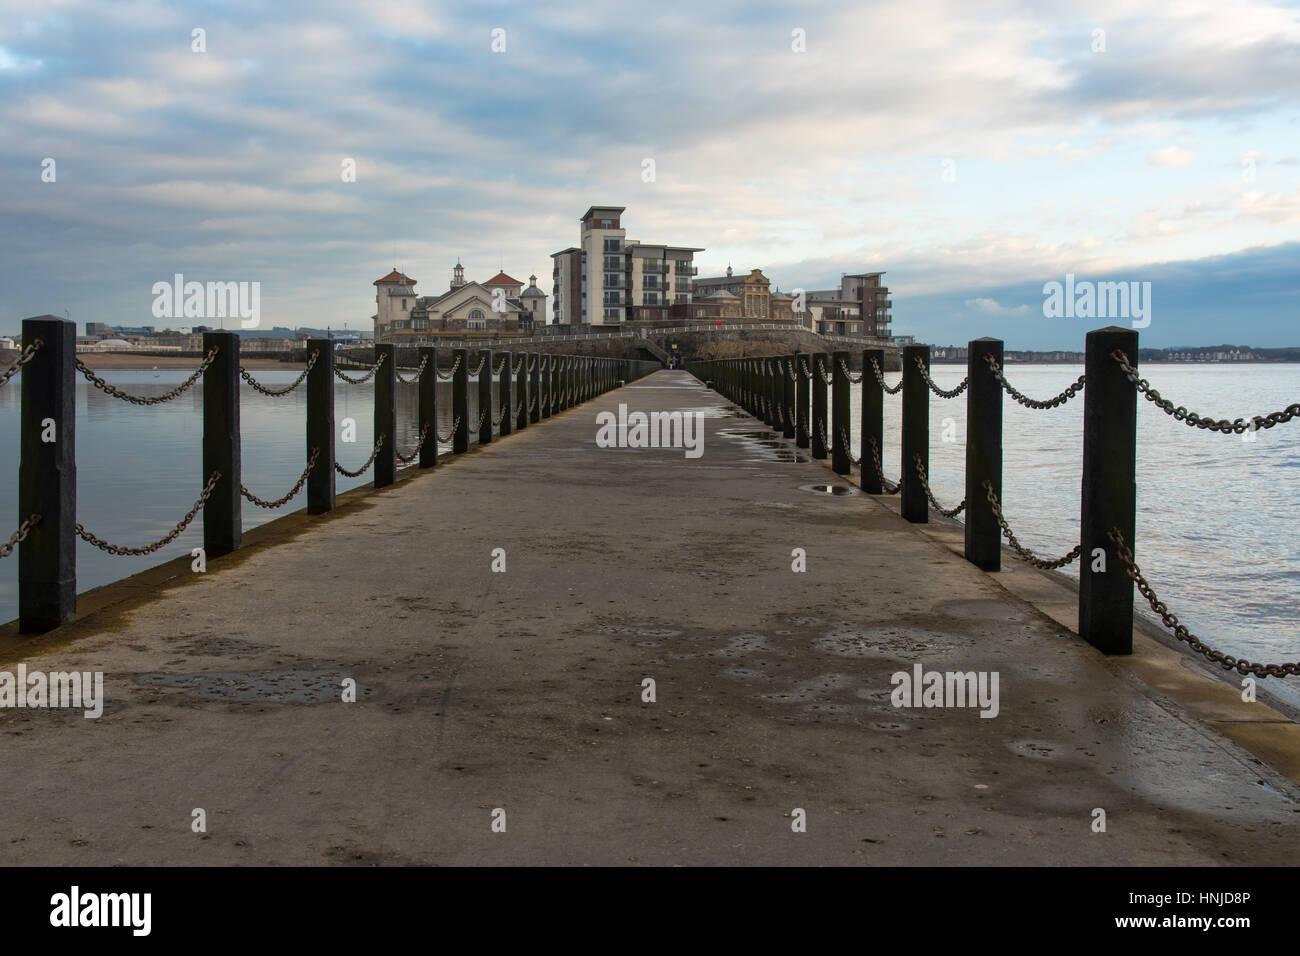 Knightstone Island, Weston-super-Mare, Somerset, UK Award winning development on island on English coast, with causeway - Stock Image